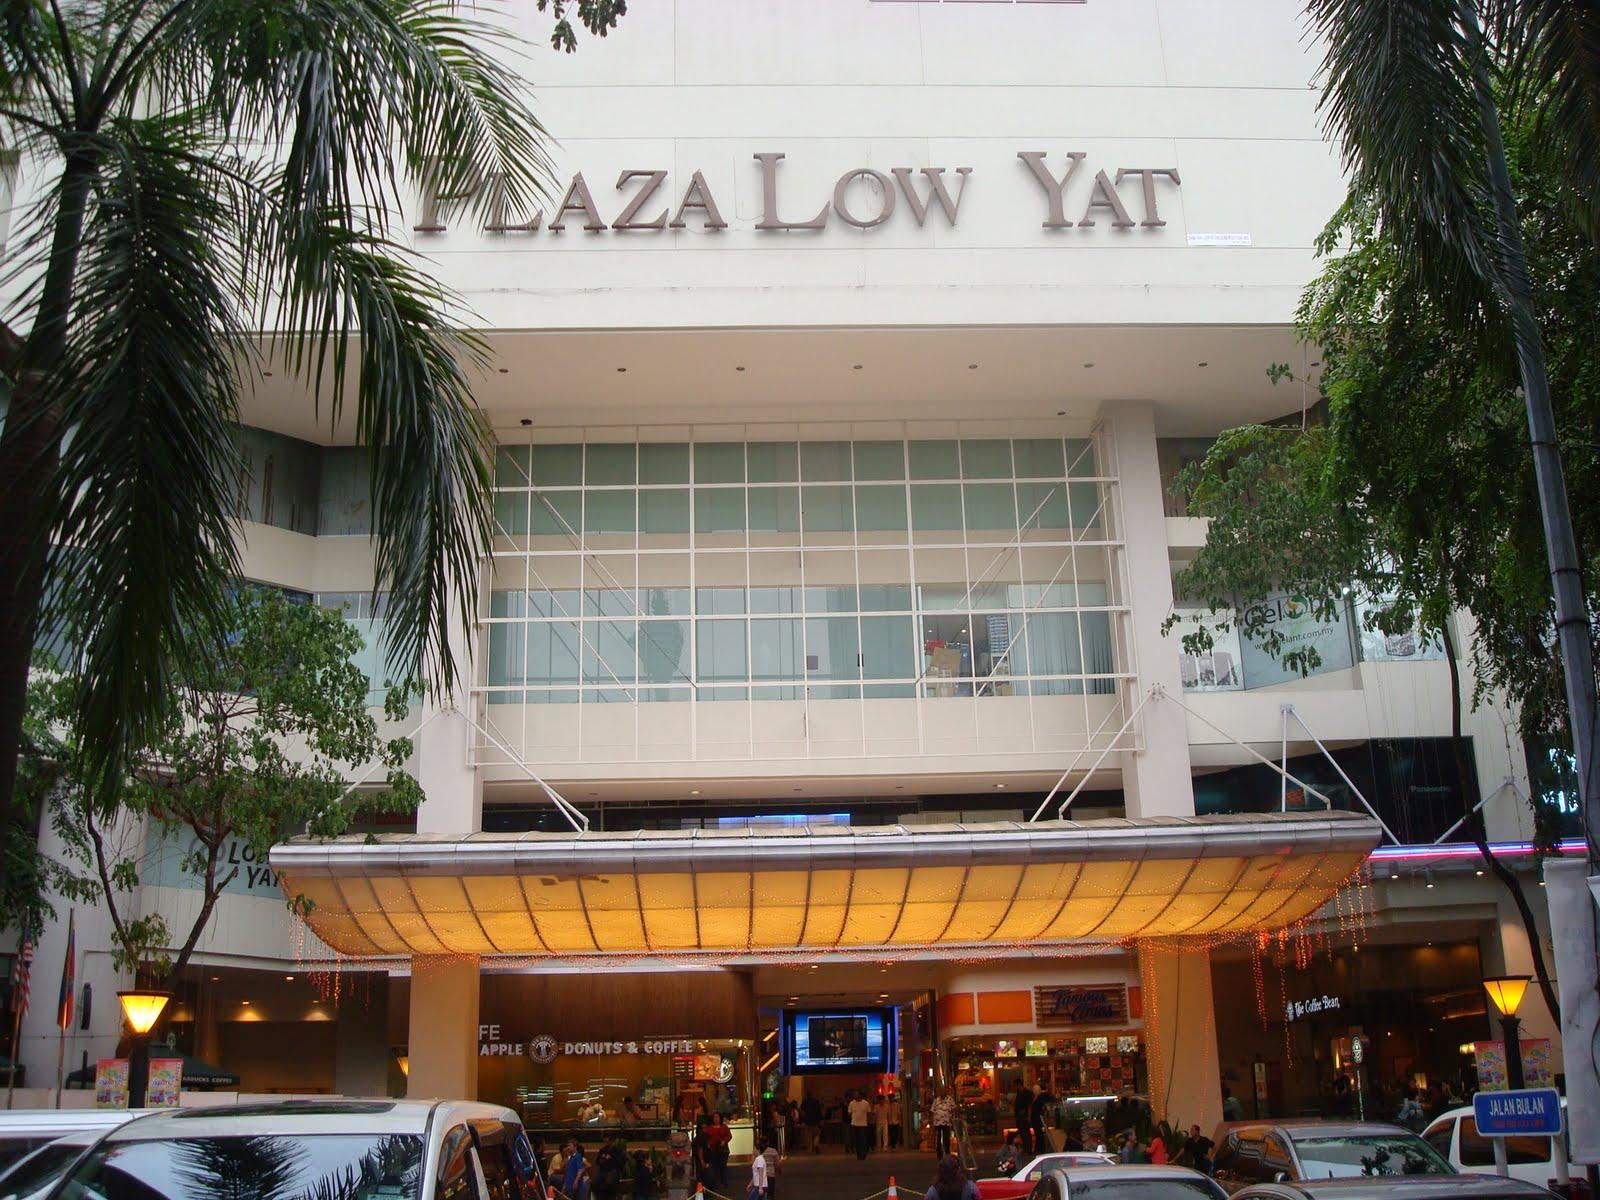 Plaza Low Yat